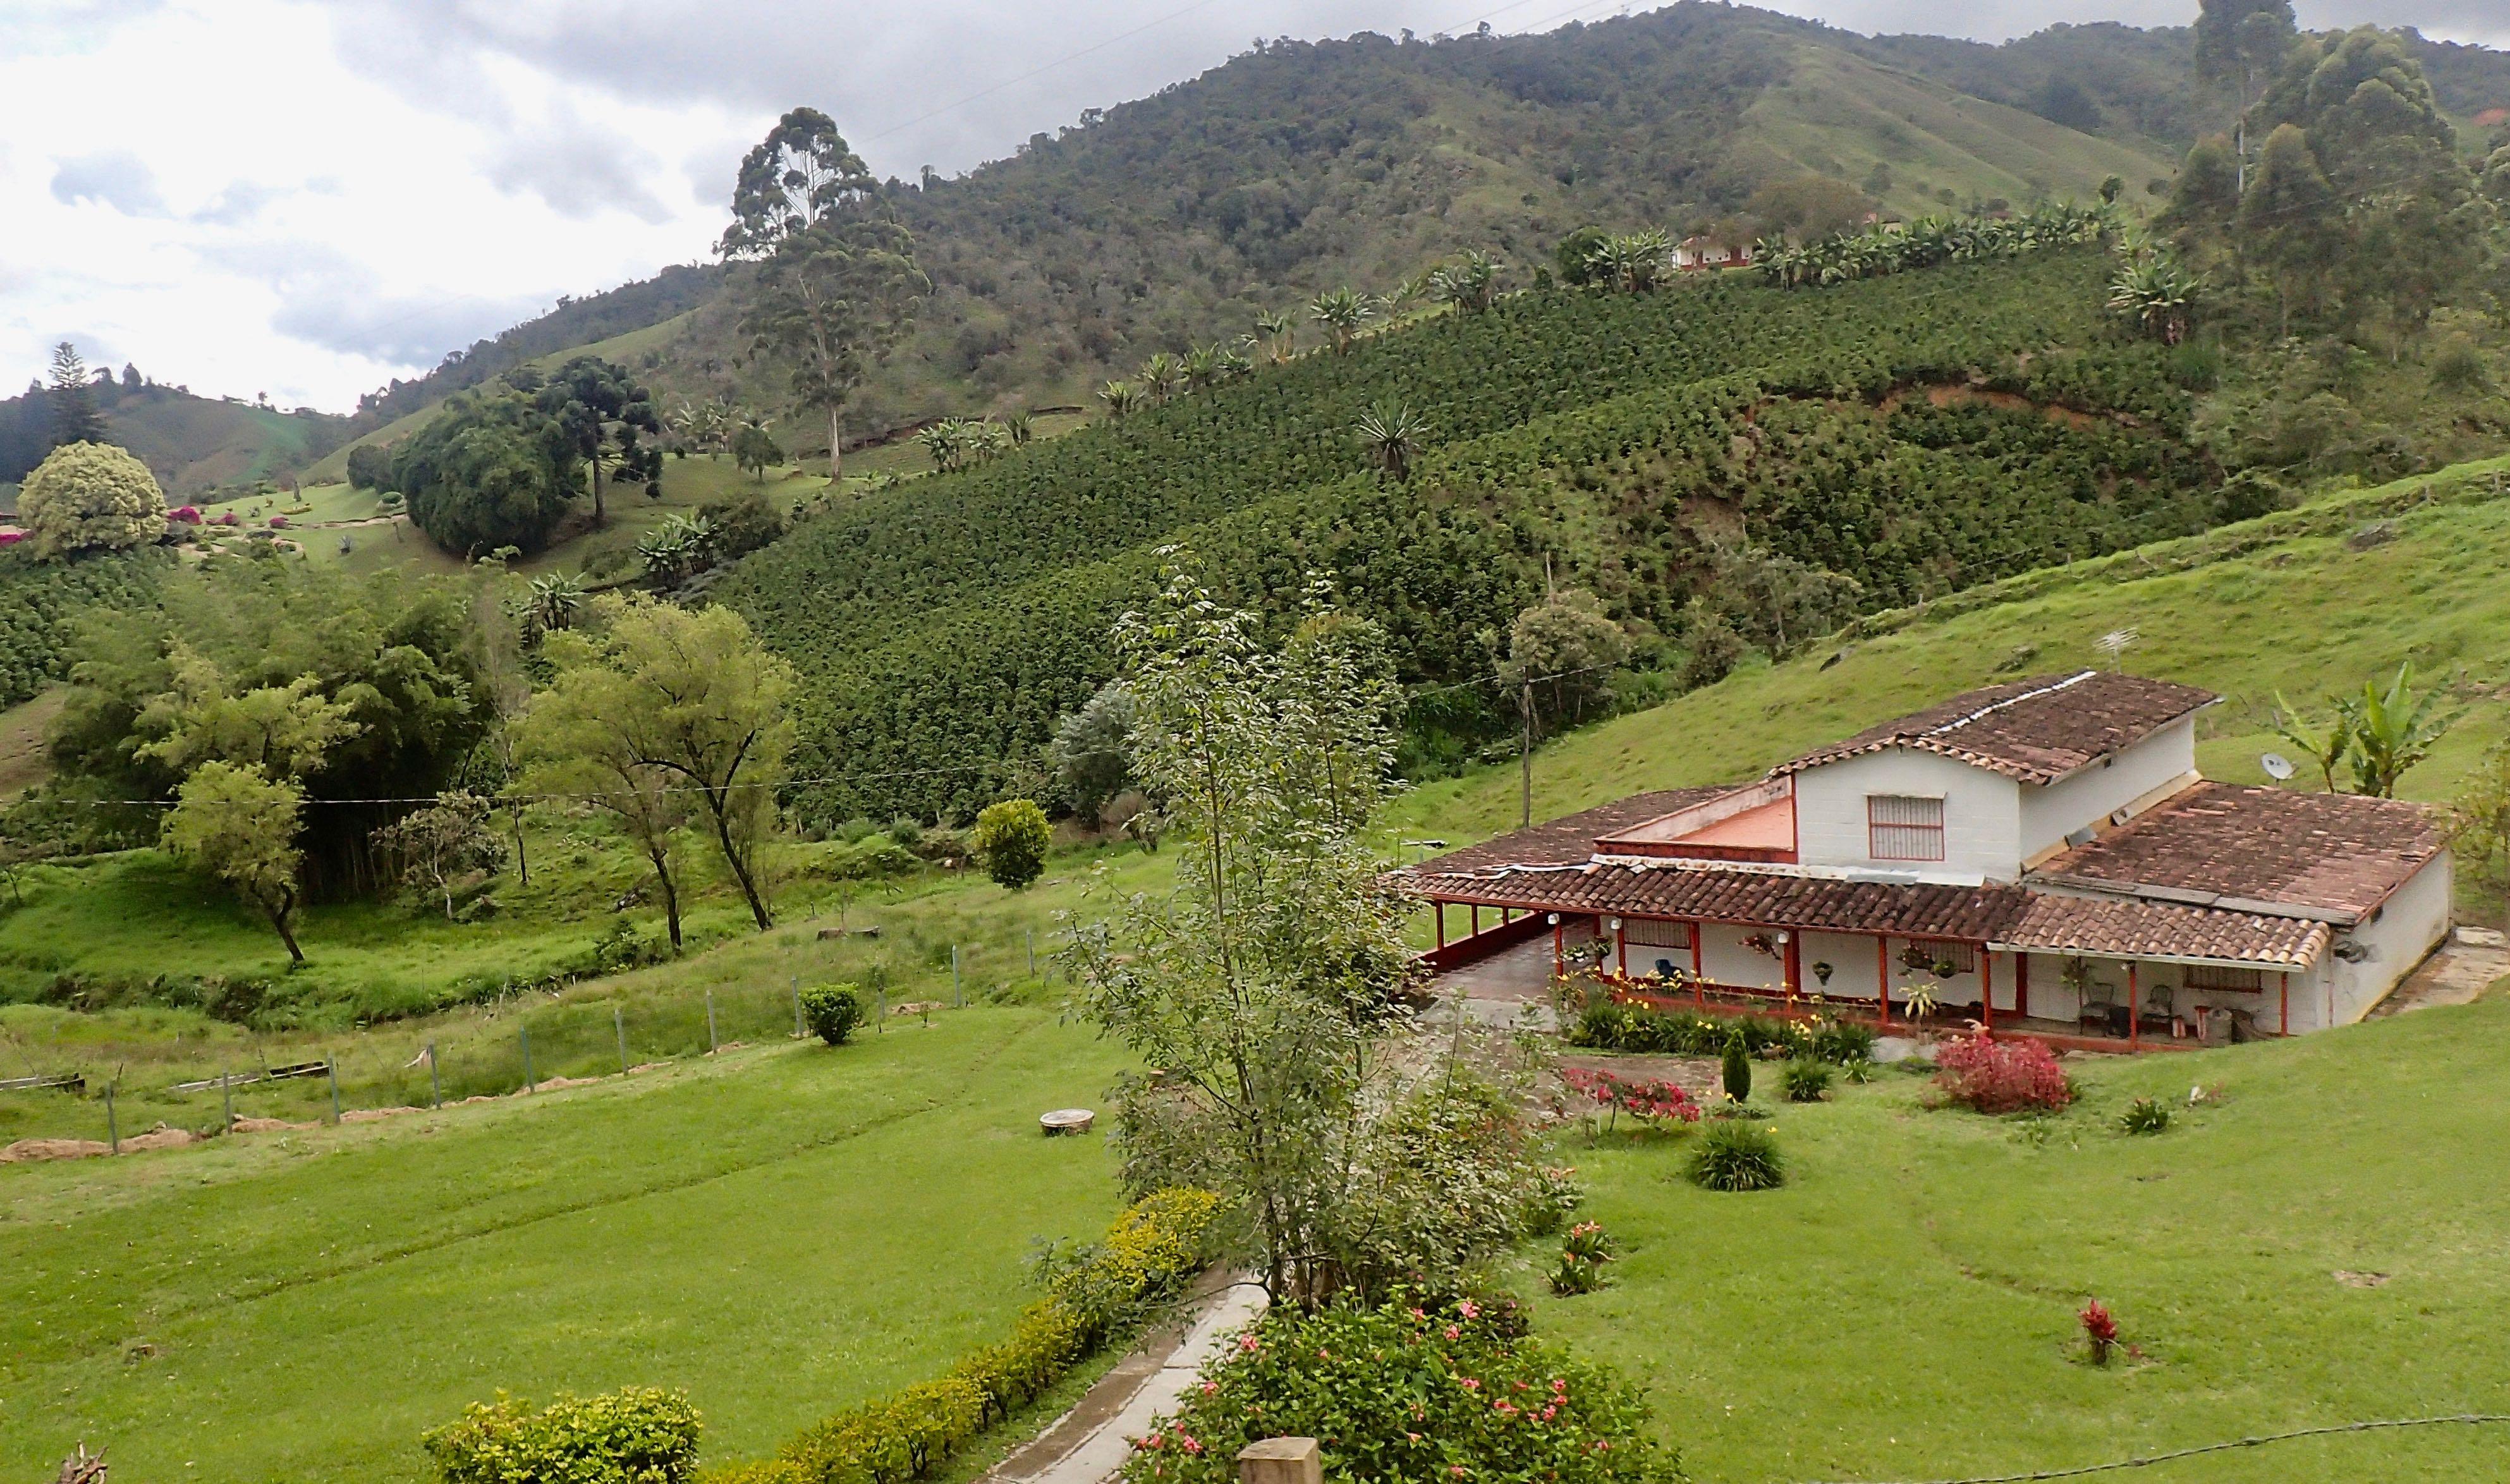 des plantations de café